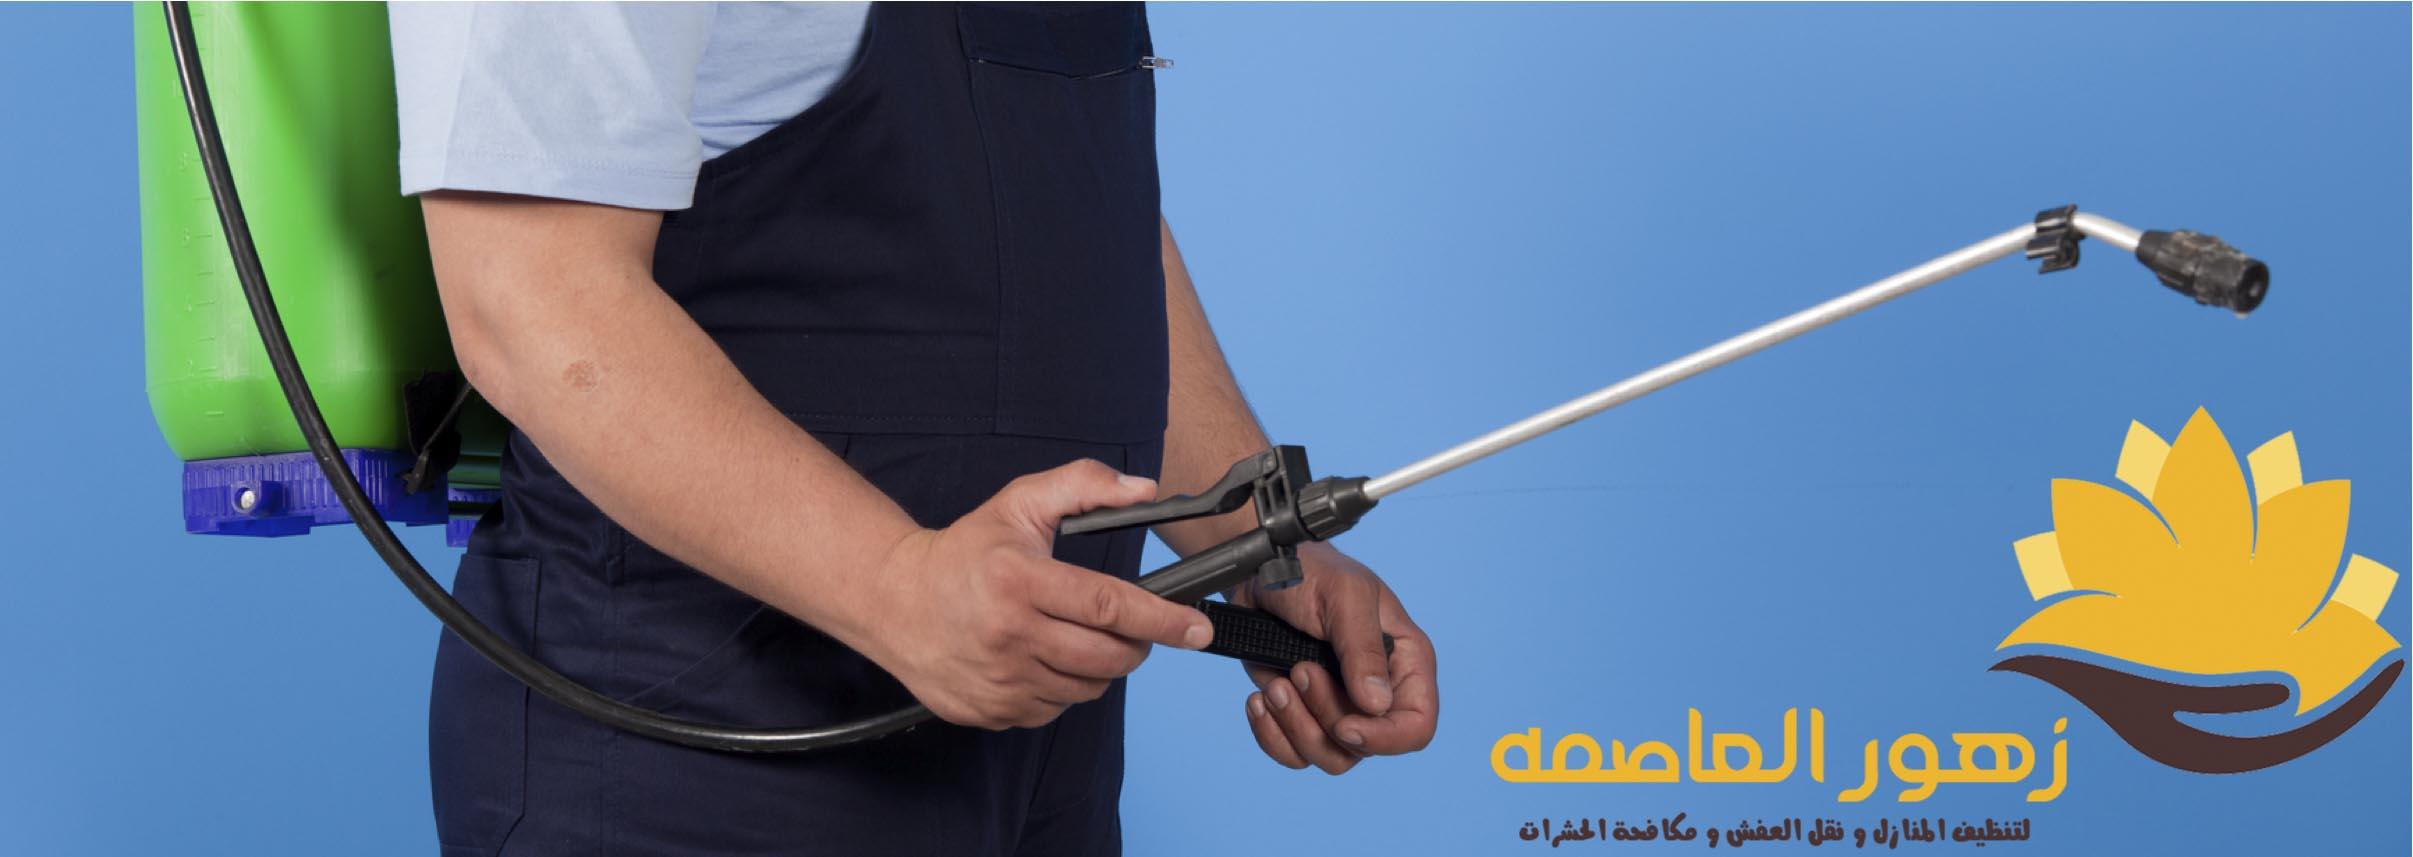 Photo of شركه مكافحه حشرات بالخرج